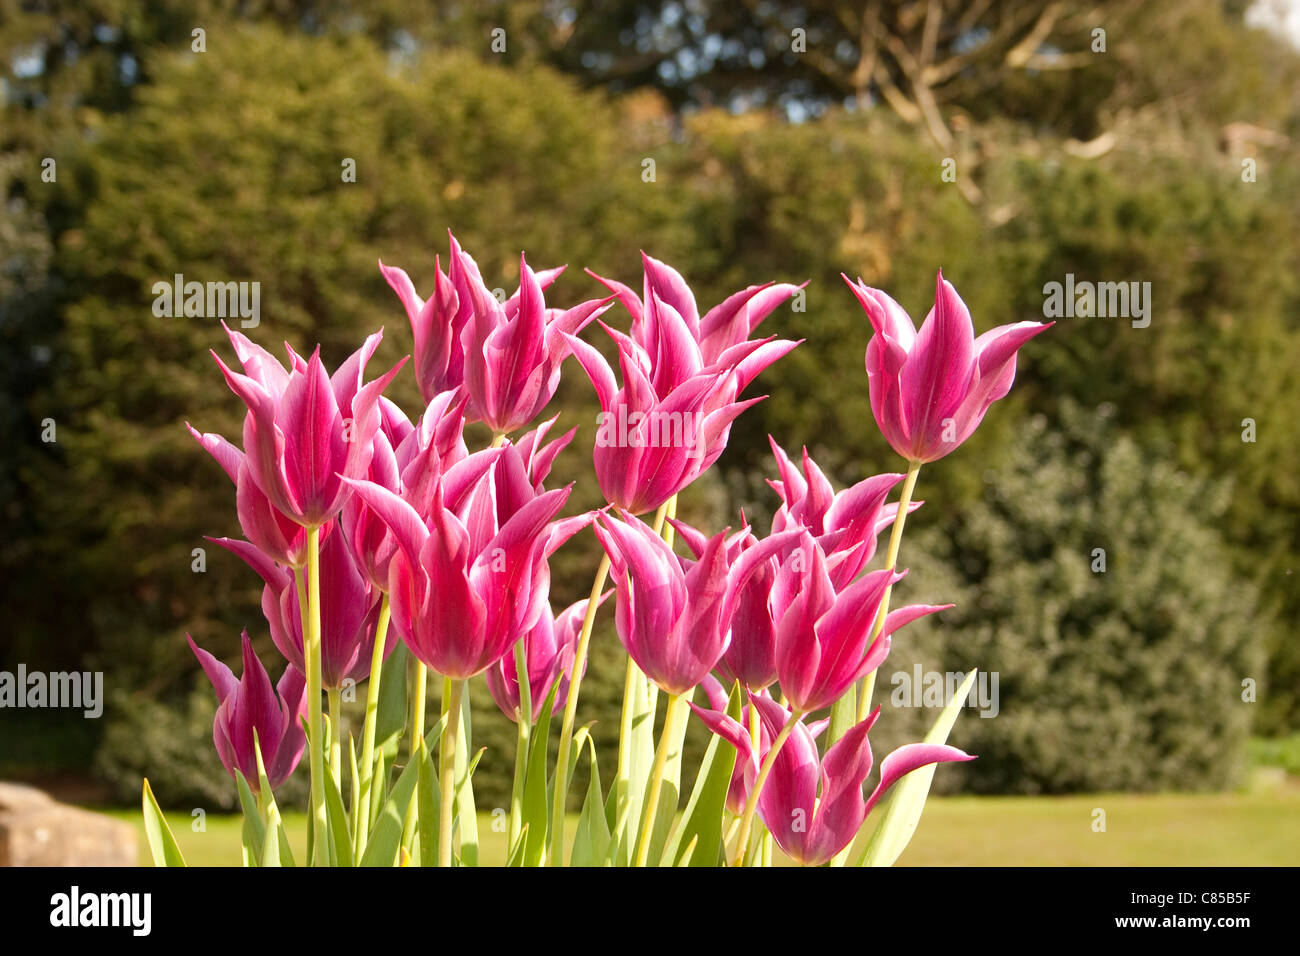 Tulip pink magenta bright back sun behind lit head flower bunch group stems leaves leaf vibrant vivid - Stock Image